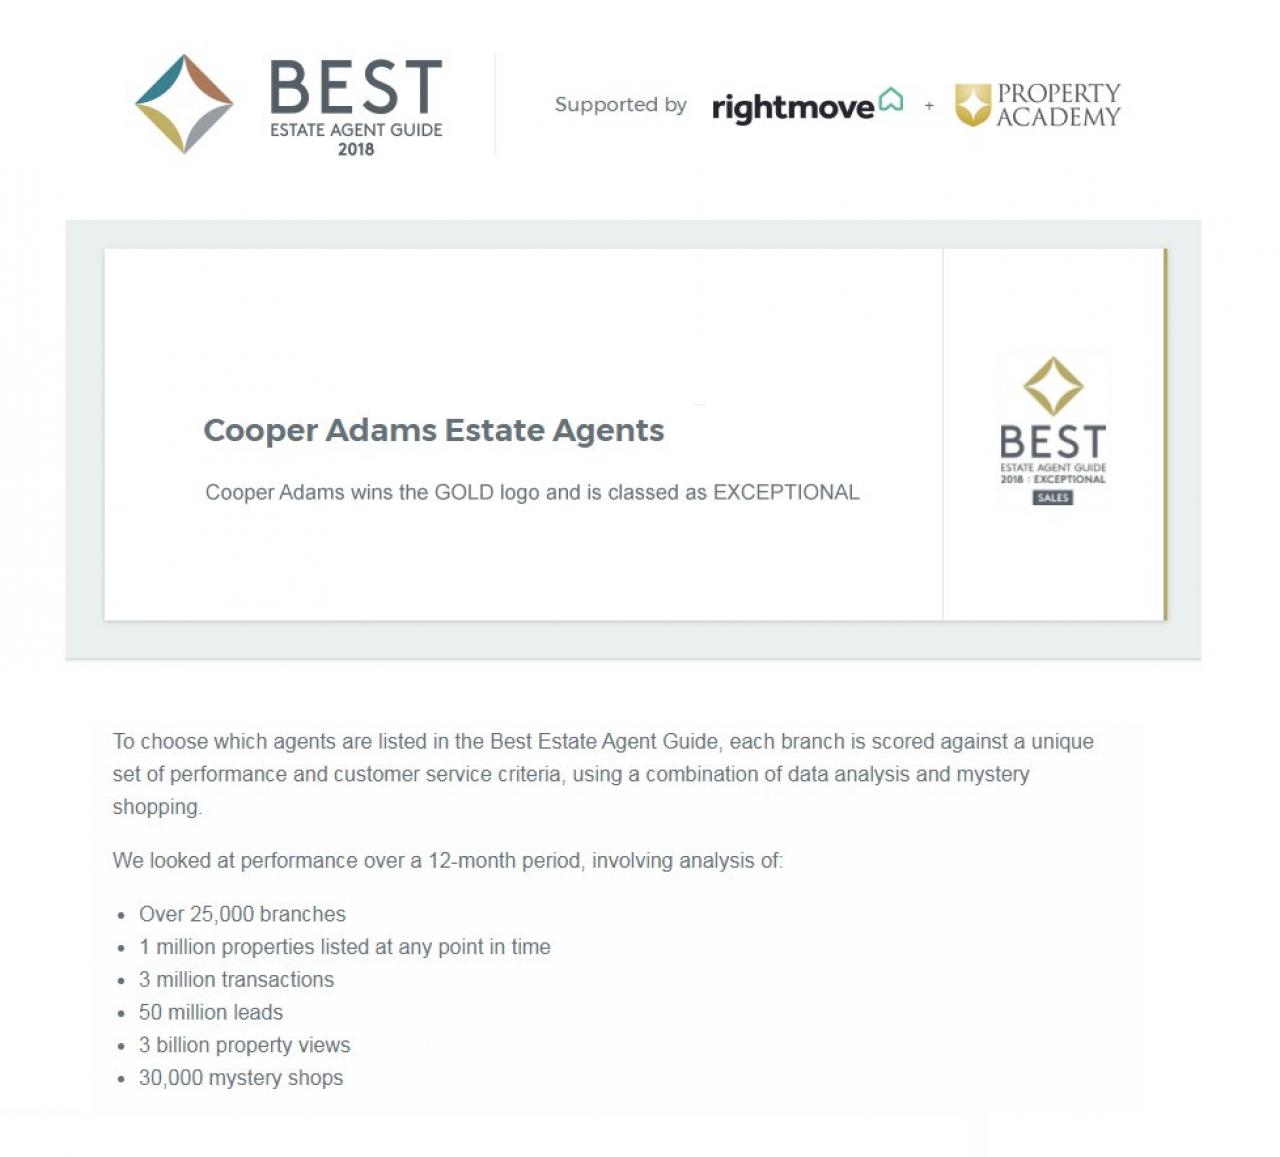 Award winning estate agent